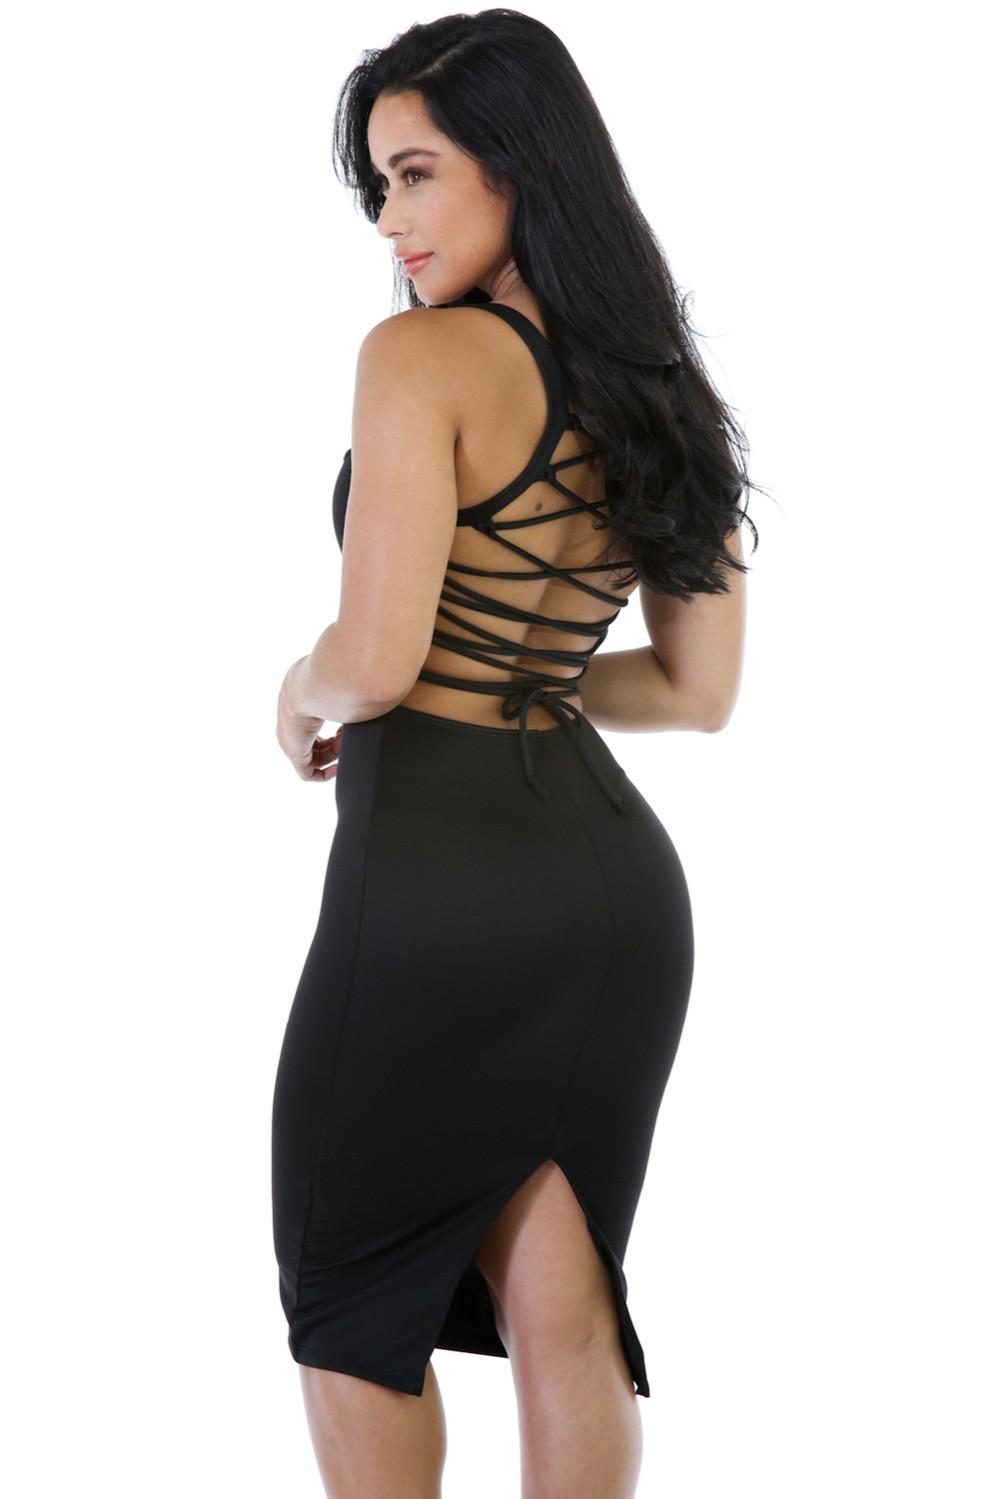 Black-Corset-Style-Back-Lace-Up-Dress-LC61159-2-3